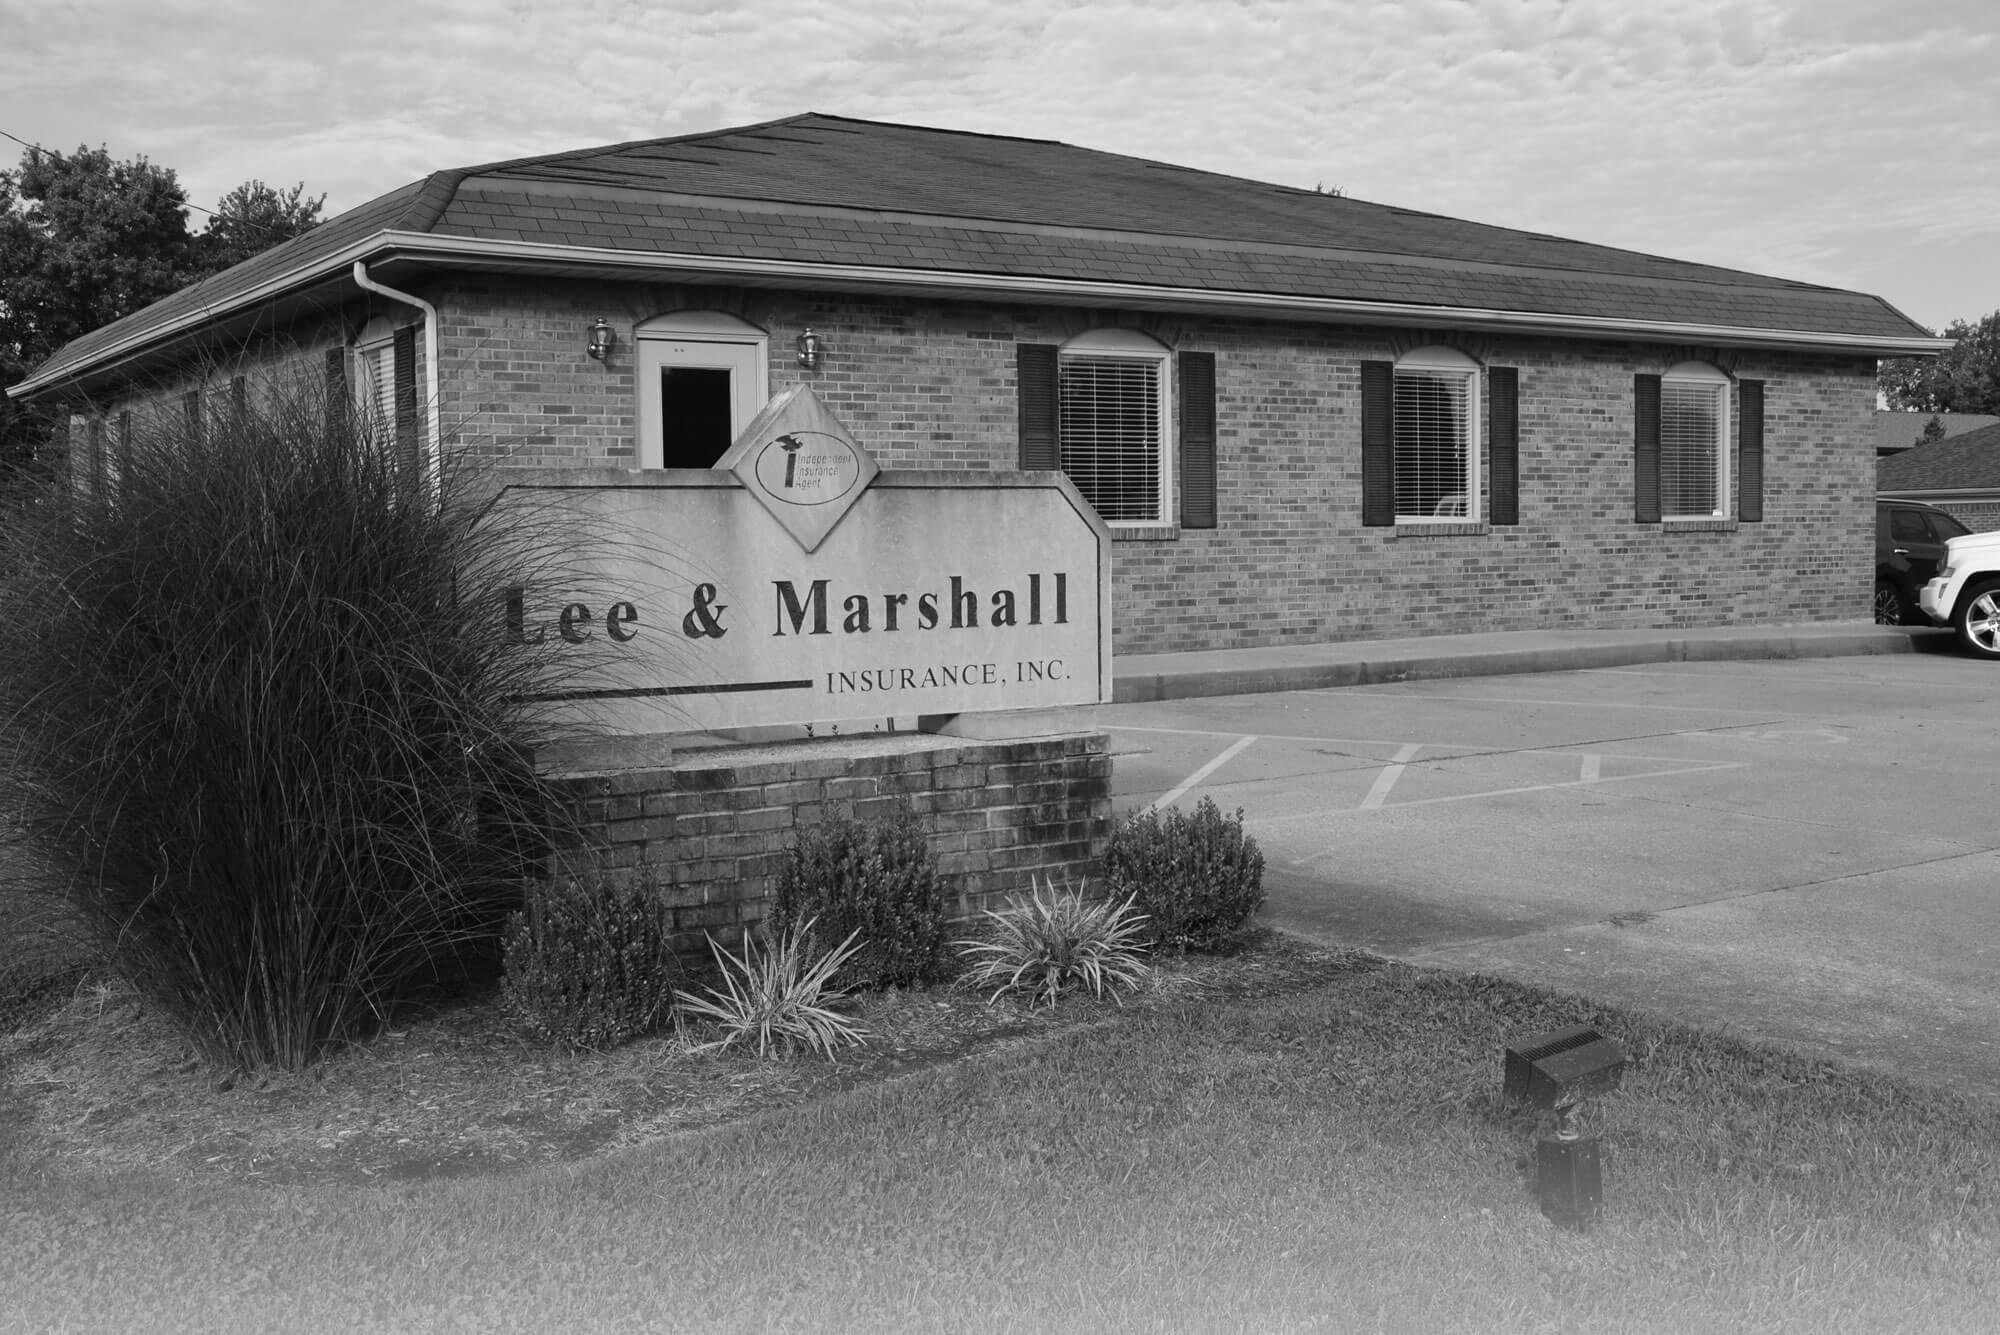 Lee & Marshall Building Exterior - B&W